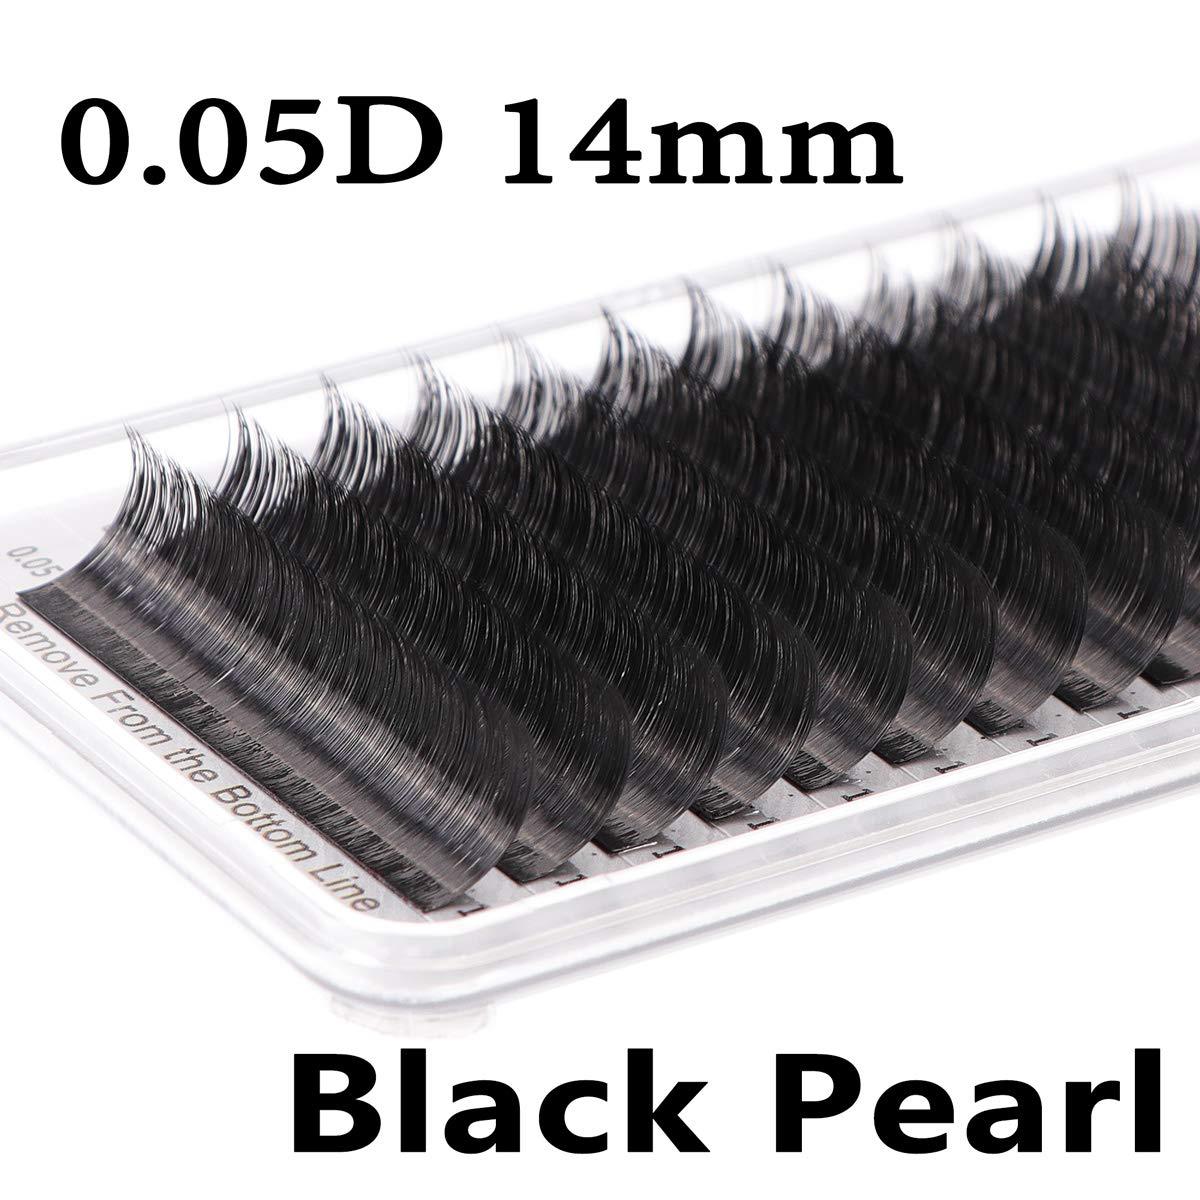 a3d2c58d9e2 Amazon.com : 0.15D Mix16-18mm Black Pearl Lash Extensions (Premium Black  Individual Eyelash) : Beauty